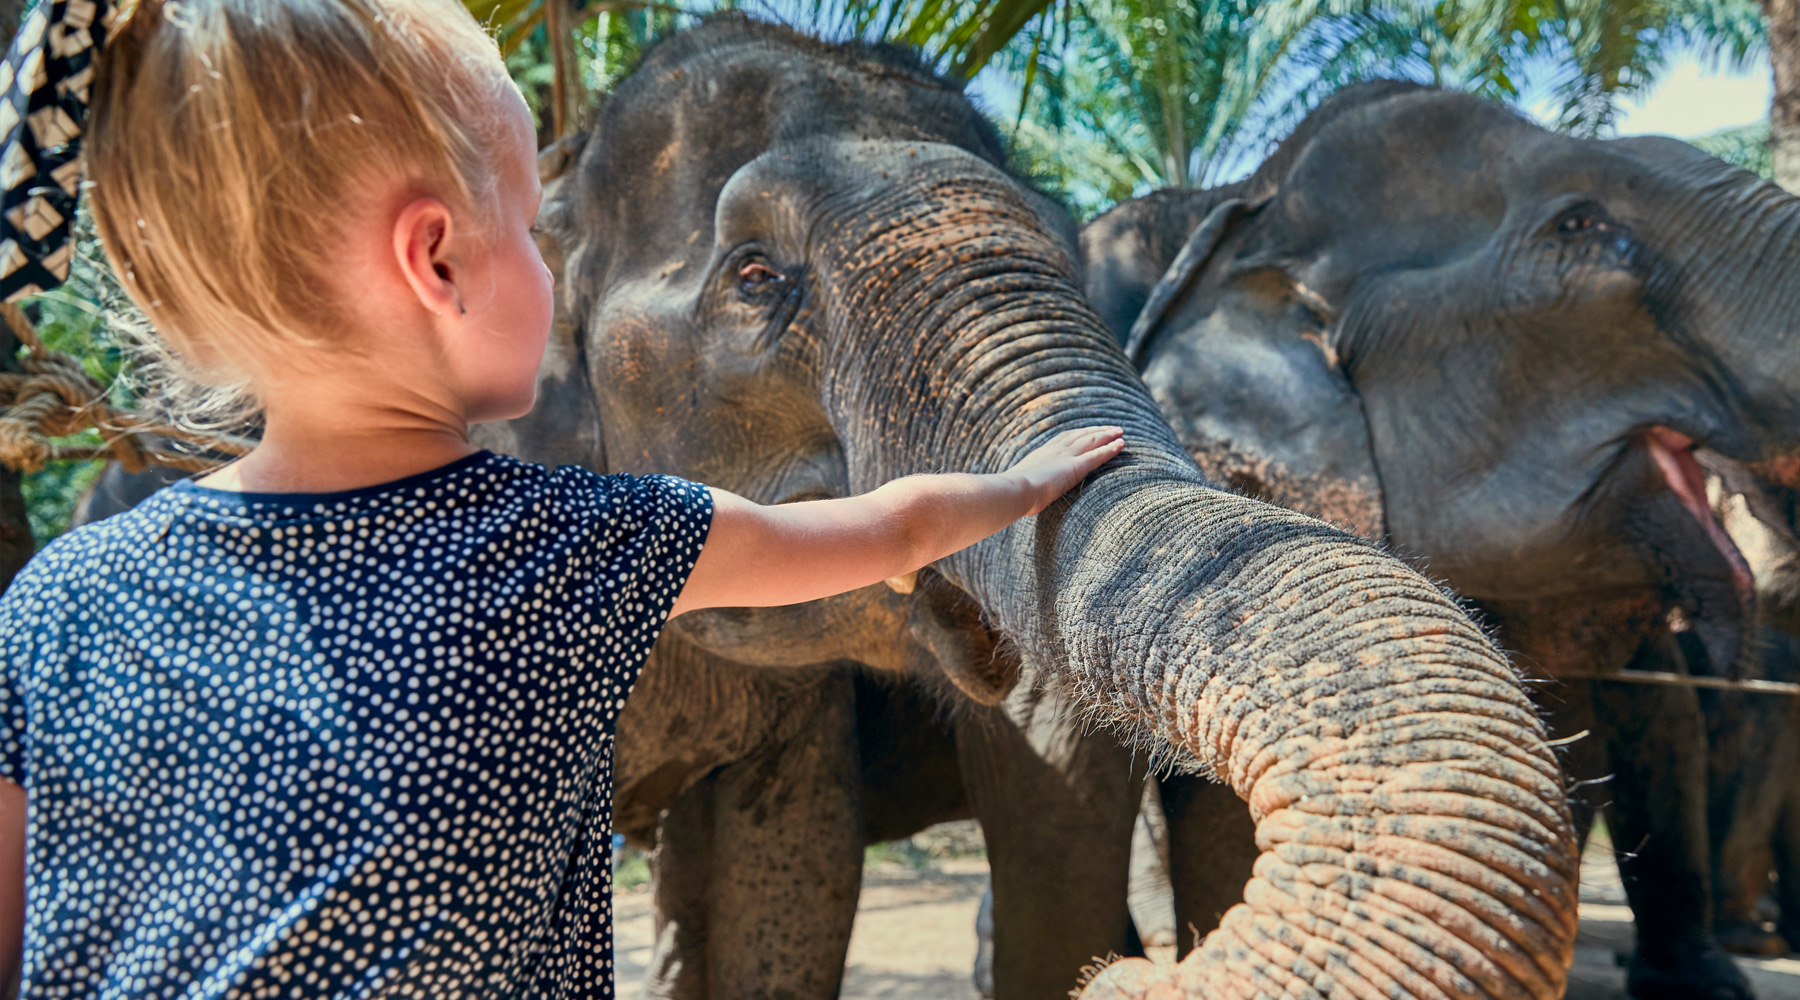 Child feeding elephant in Thailand